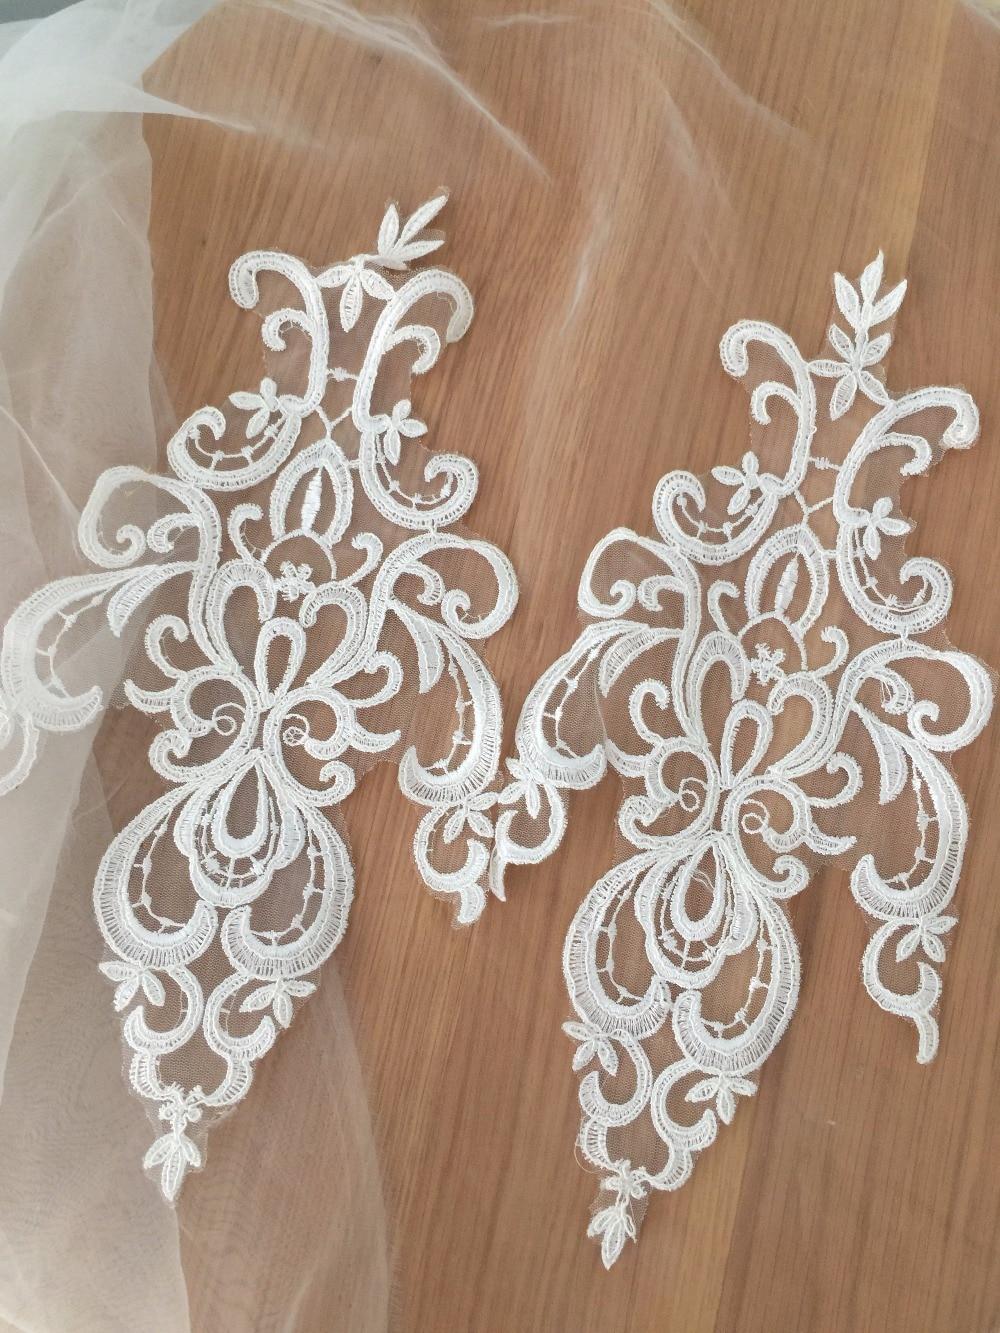 Bcu Customer Service >> Beaiutiful Soft White French Alencon Lace Fabric Applique ...